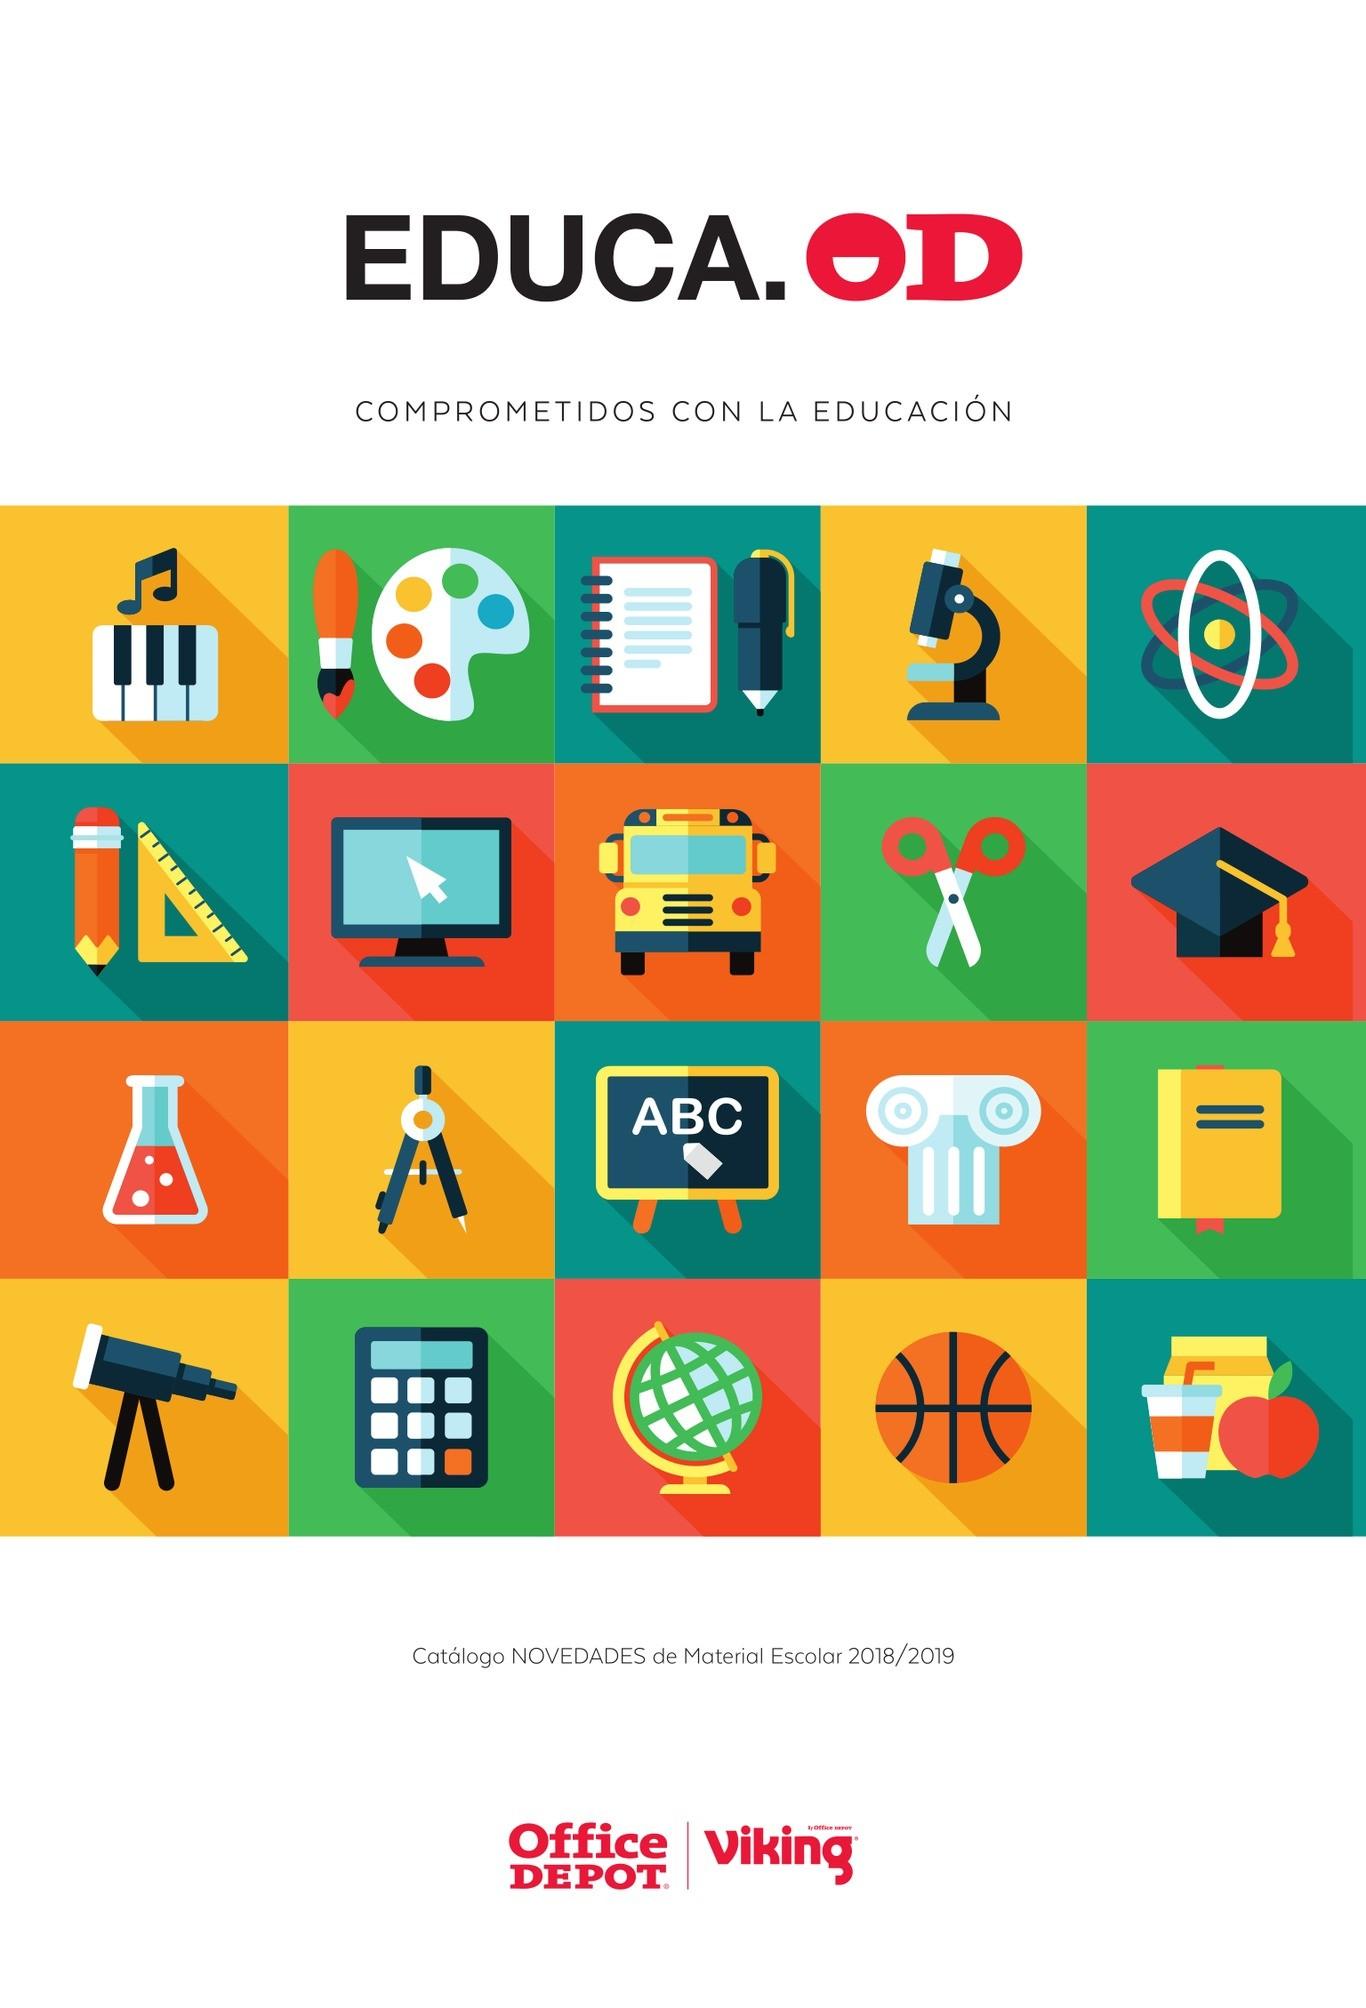 Calendario 2020 Generalitat De Catalunya Más Recientemente Liberado Mrw Falset Of Calendario 2020 Generalitat De Catalunya Más Recientes Calaméo Decret De Plurilingüisme Ii